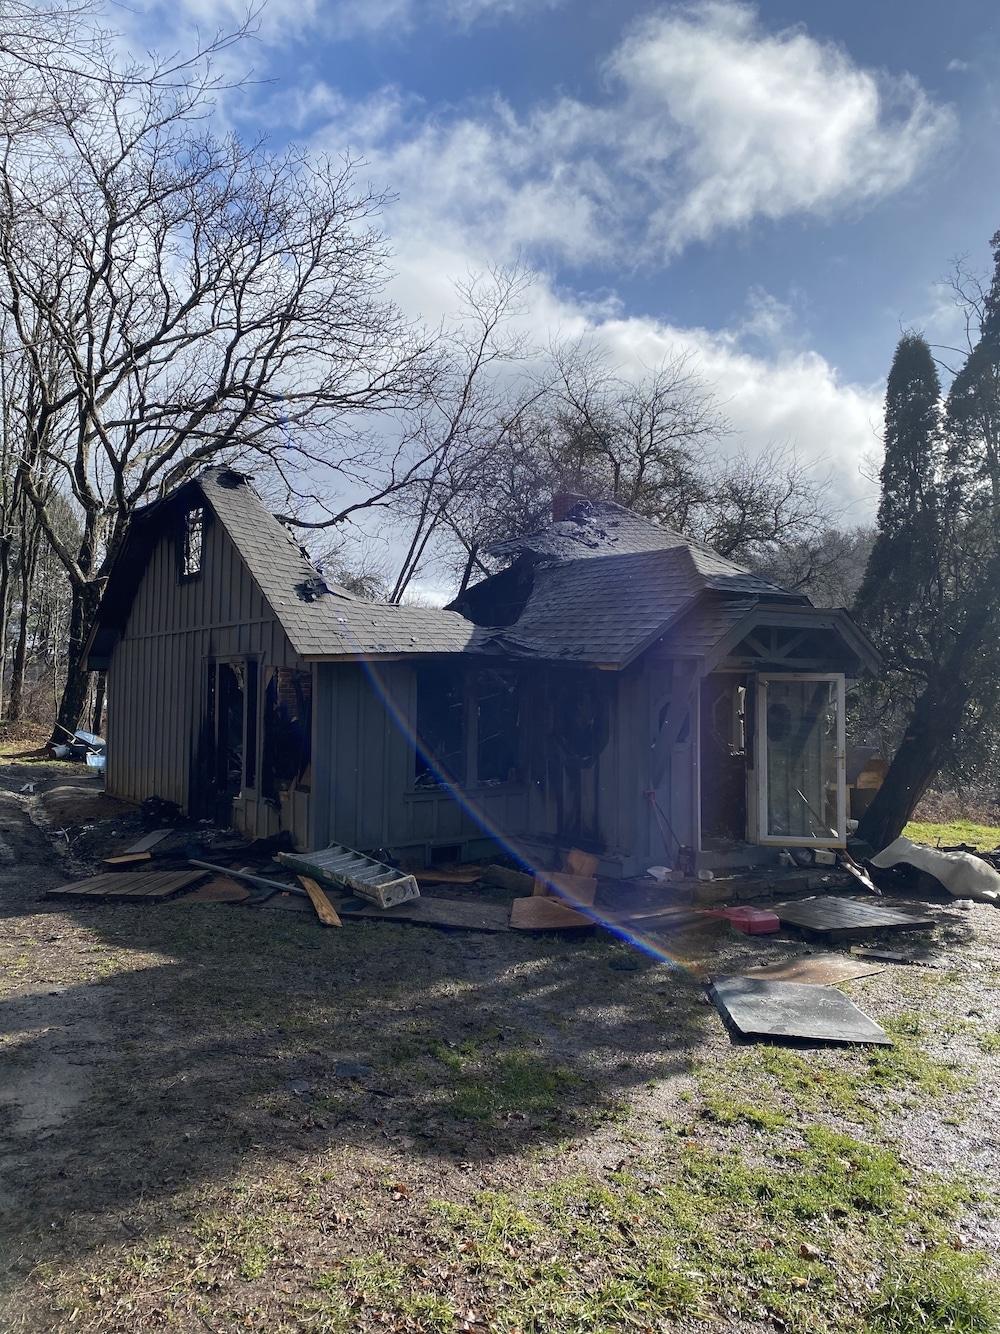 Fire destroys Hardin Road home on Friday night